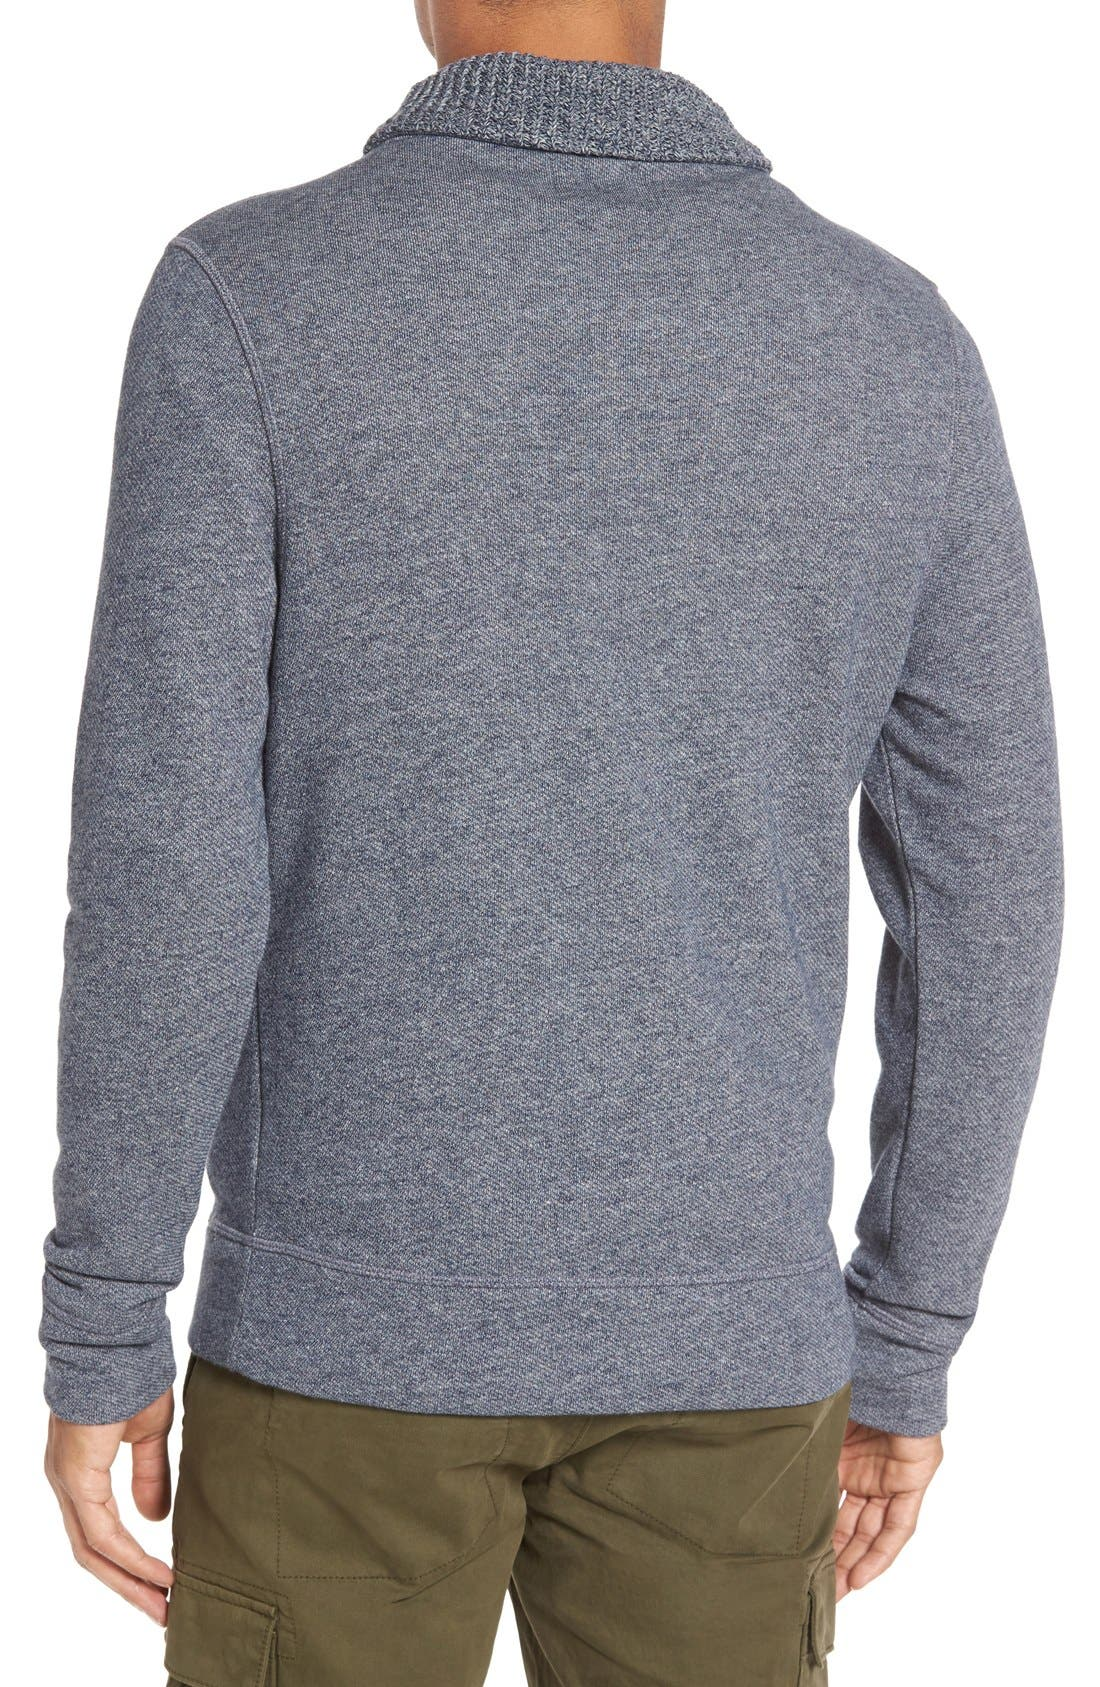 Alternate Image 2  - Billy Reid 'Shiloh' Shawl Collar Sweatshirt